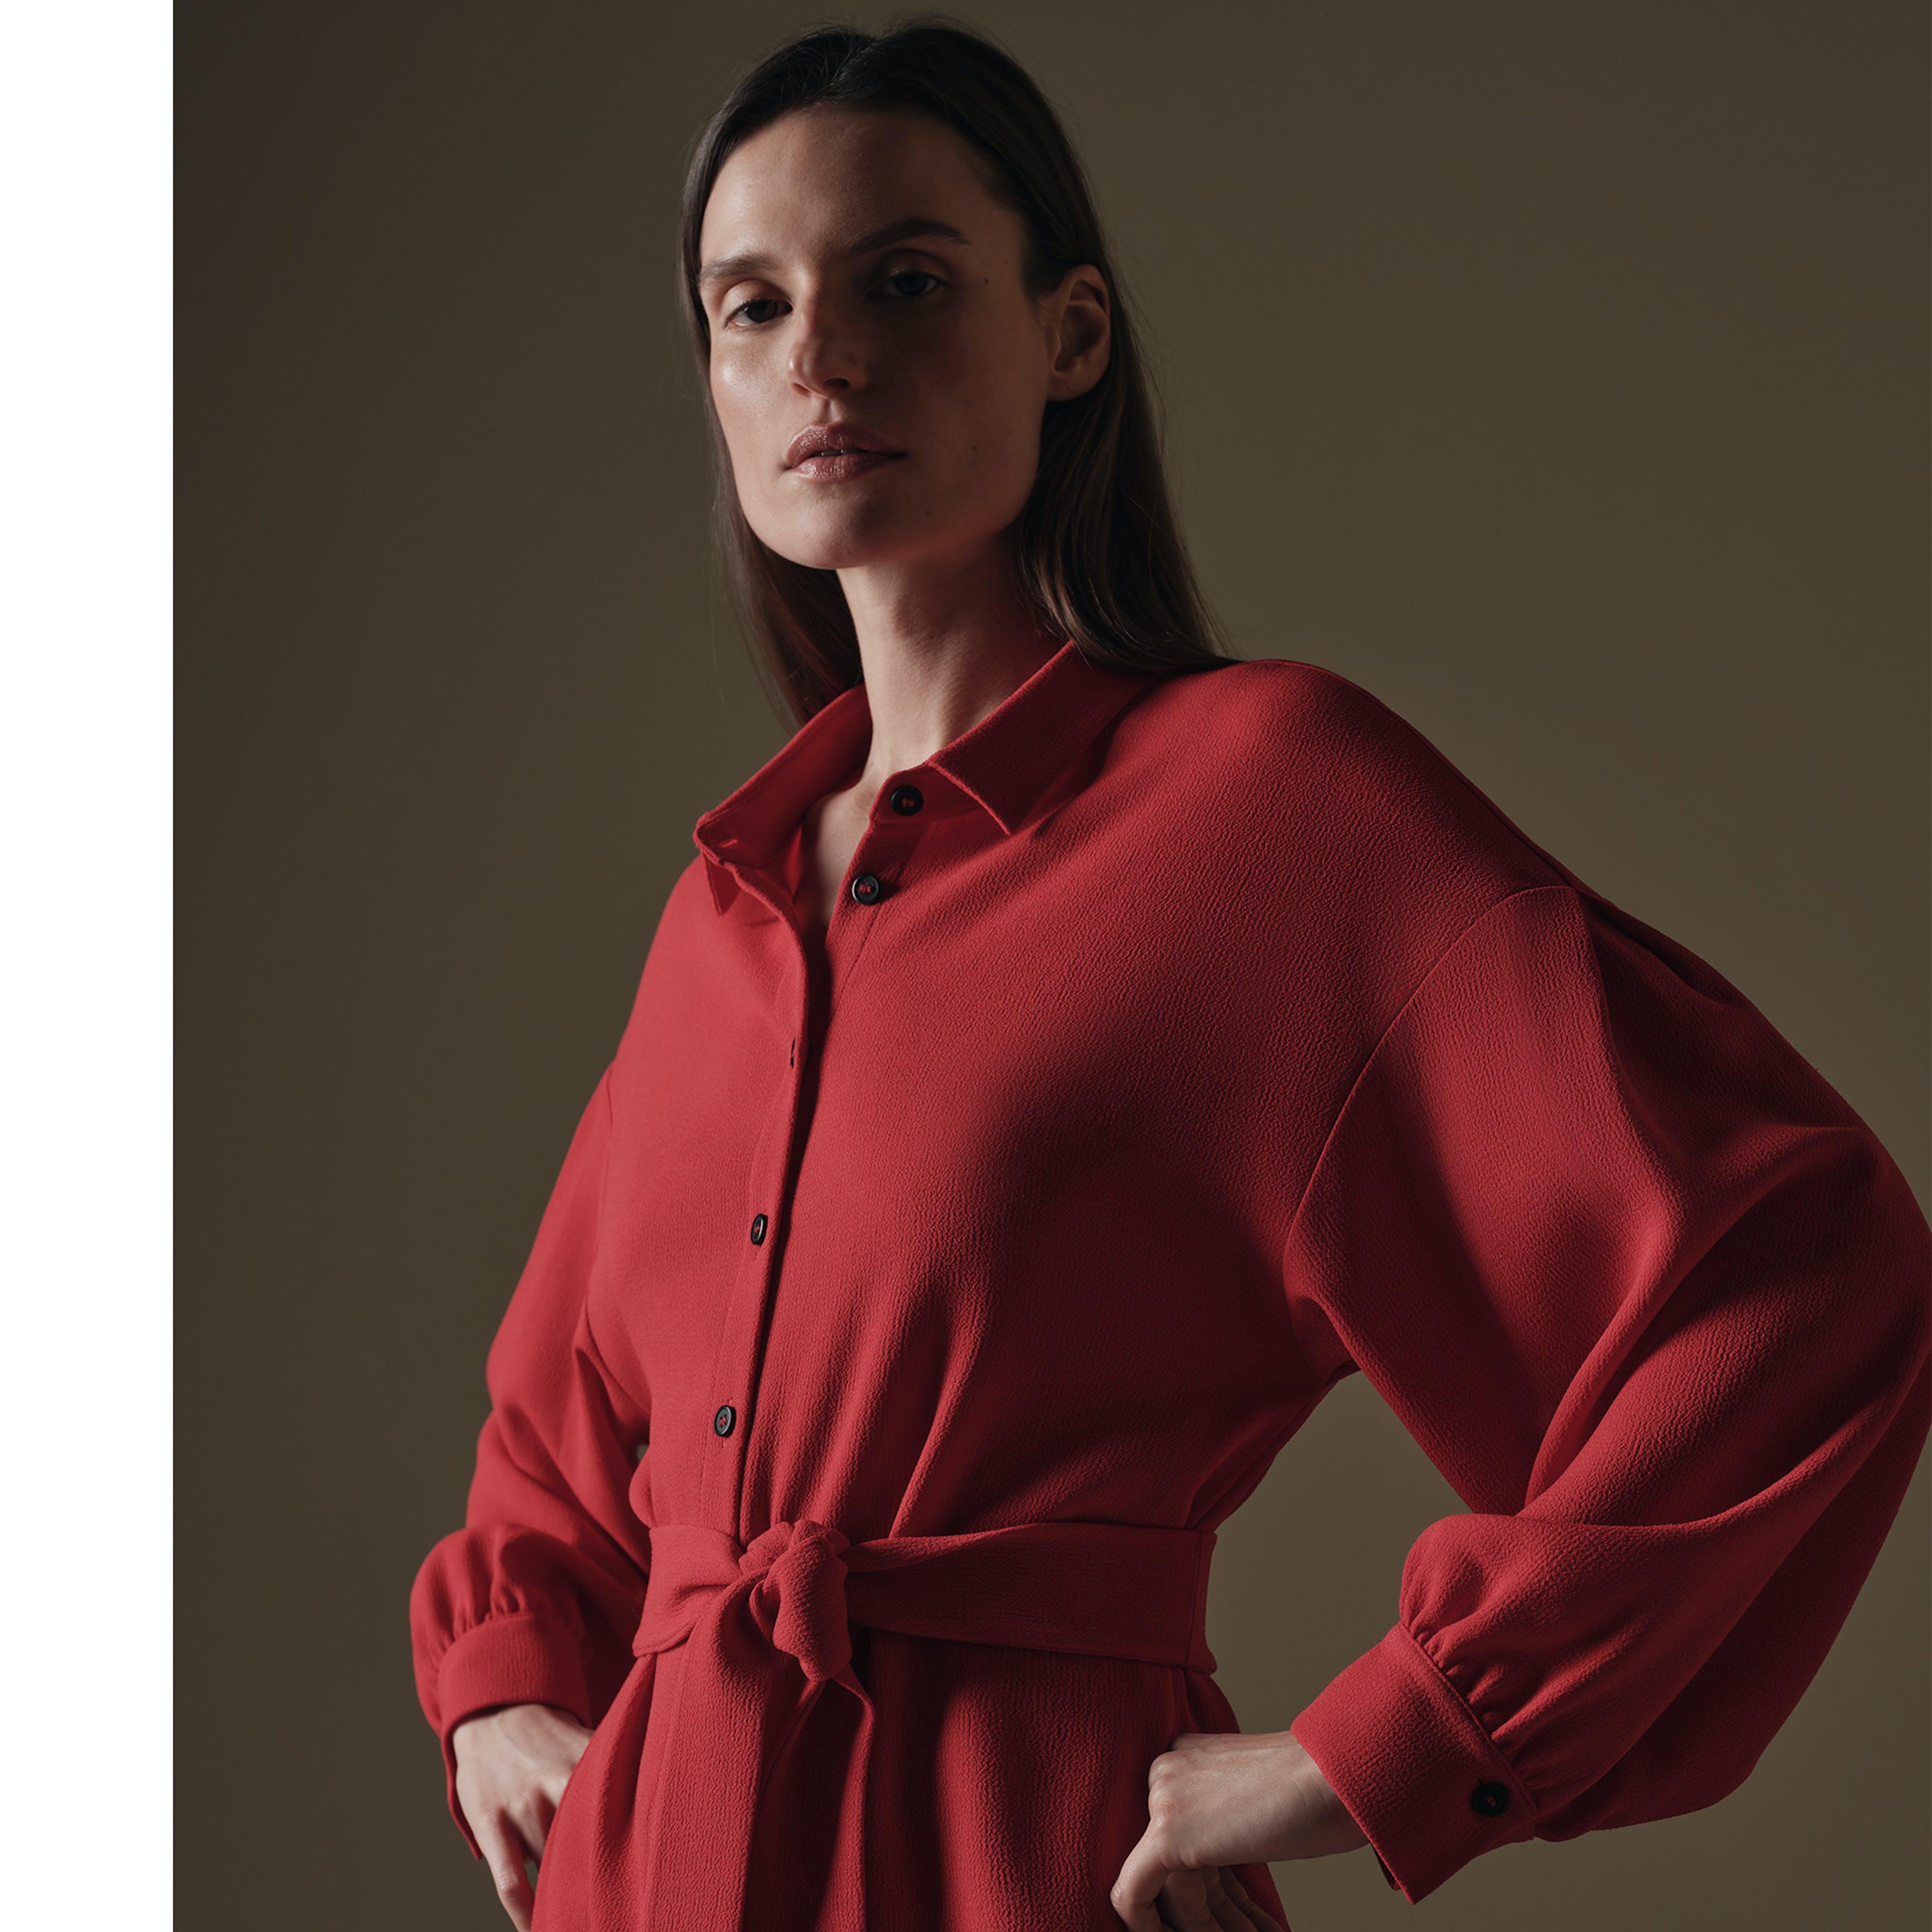 Damen rotes Kleid